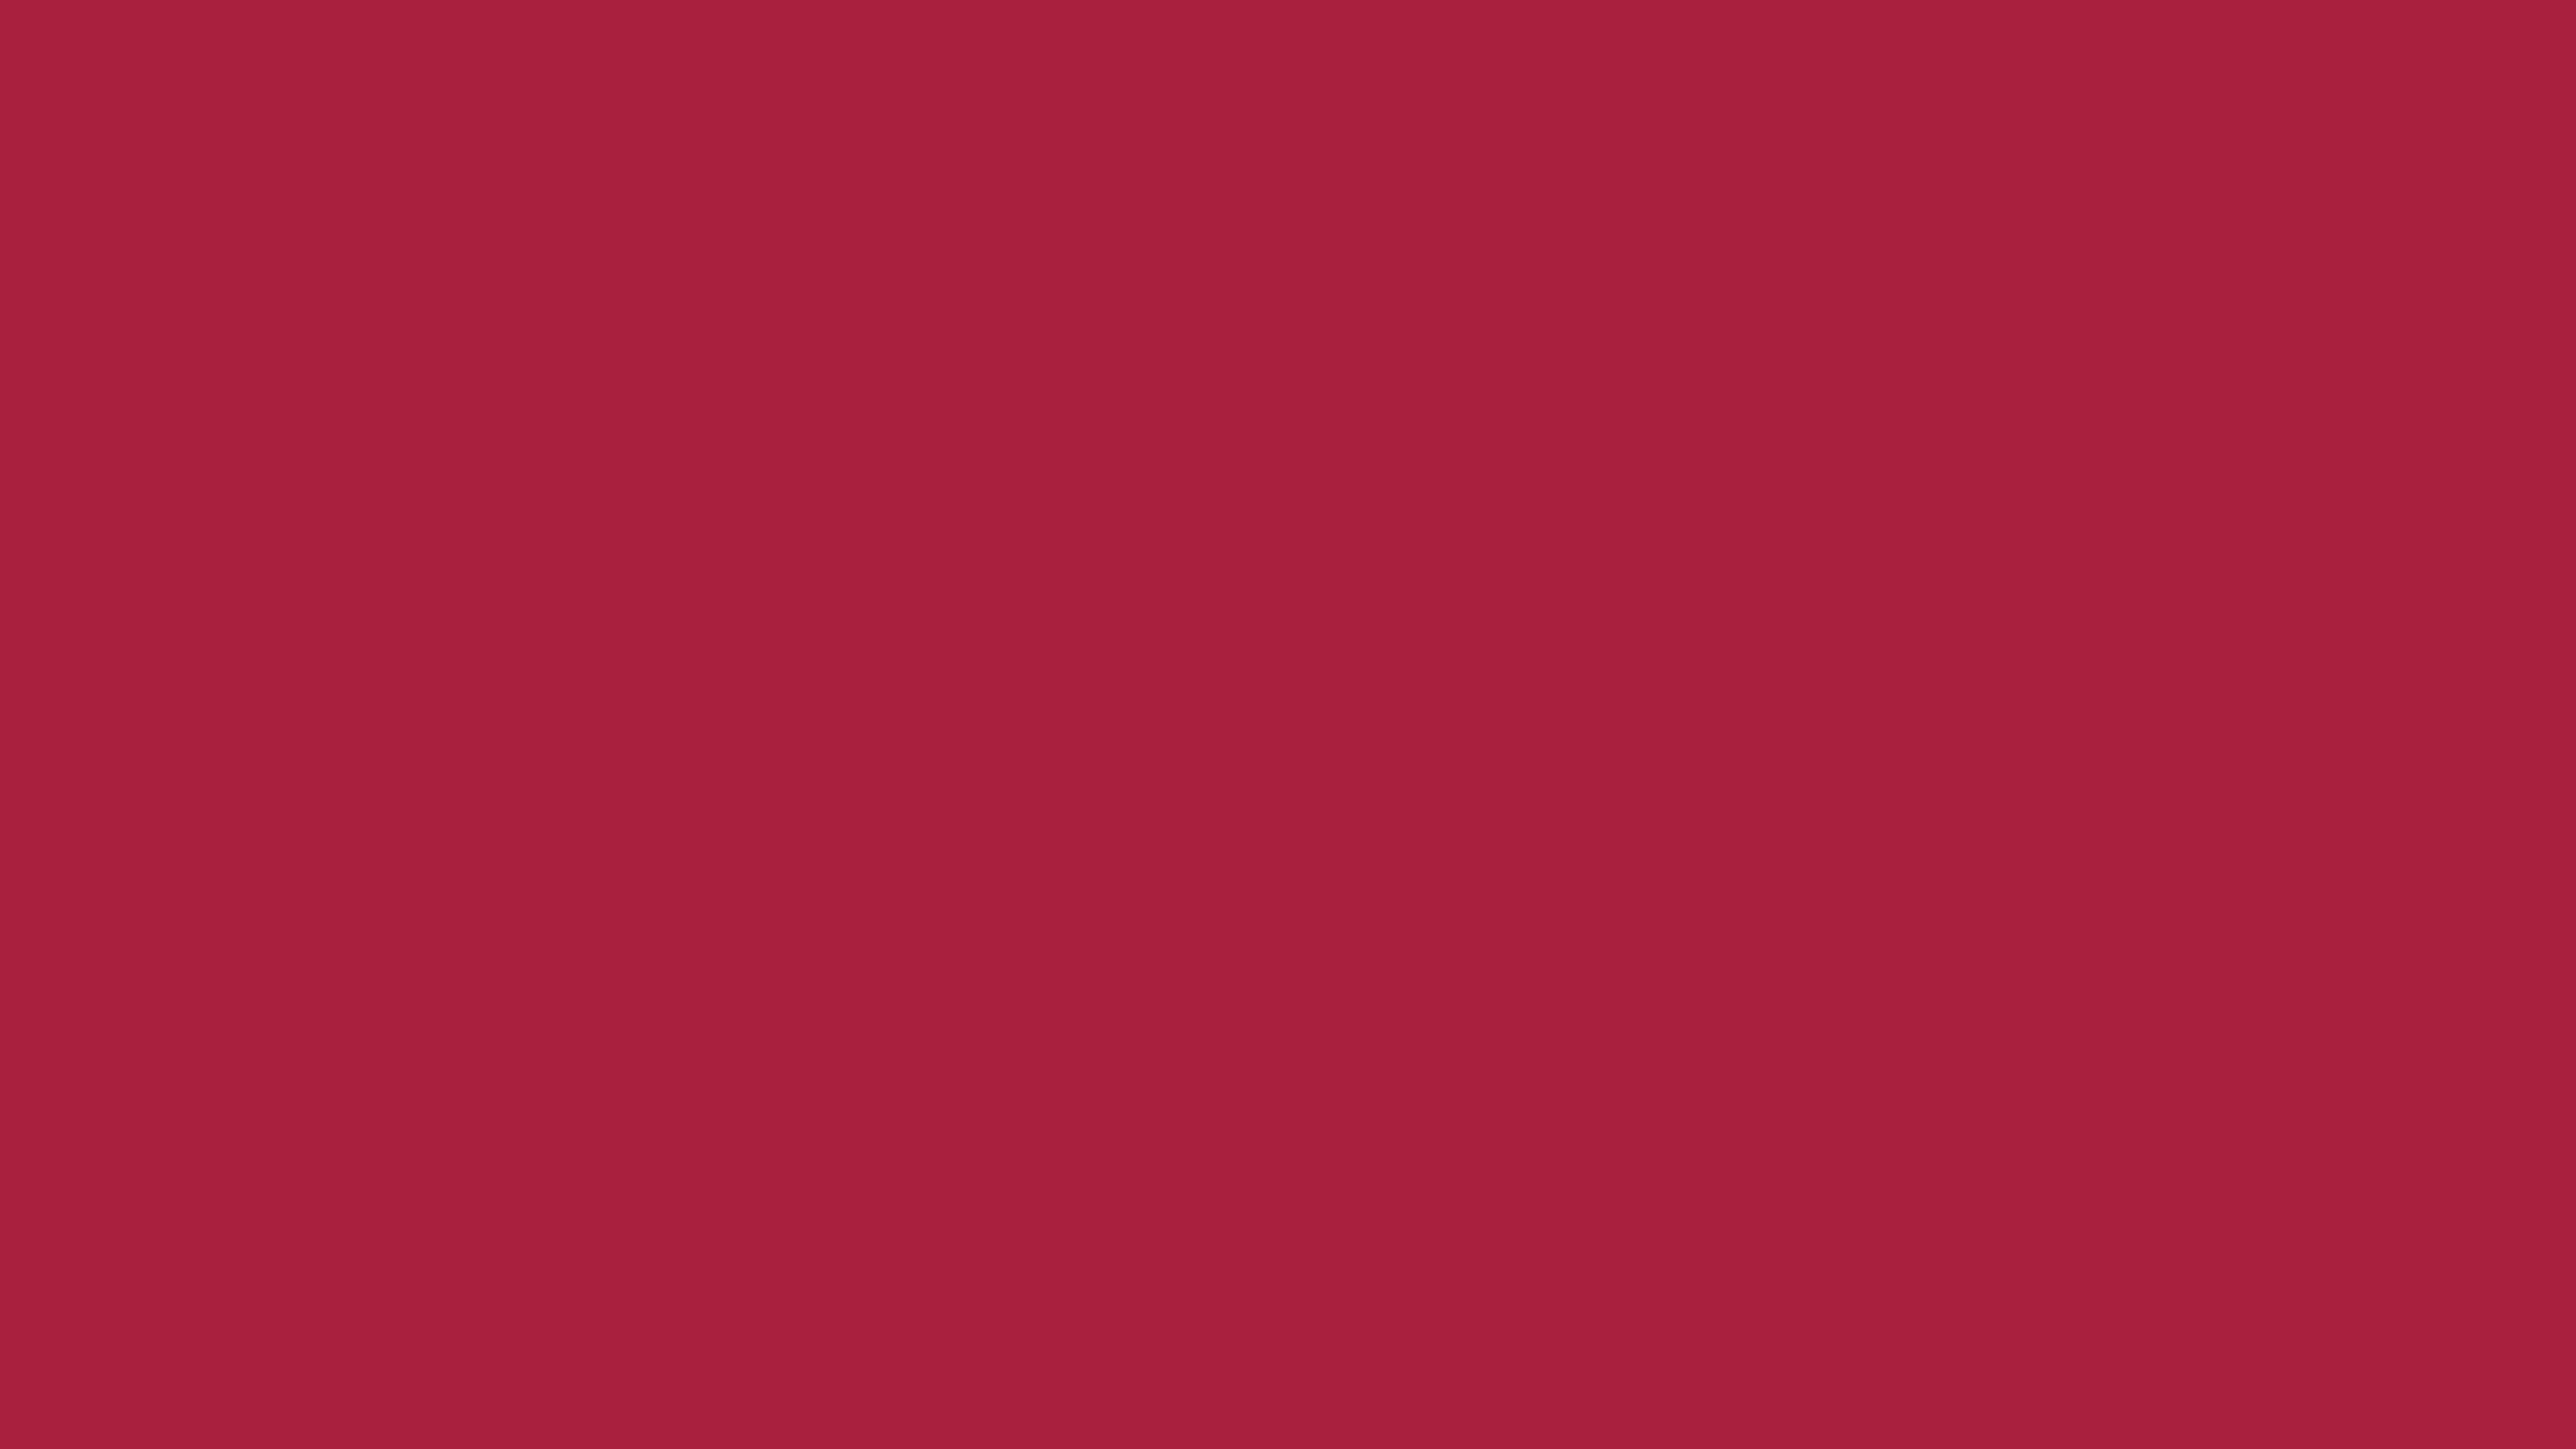 4096x2304 Deep Carmine Solid Color Background